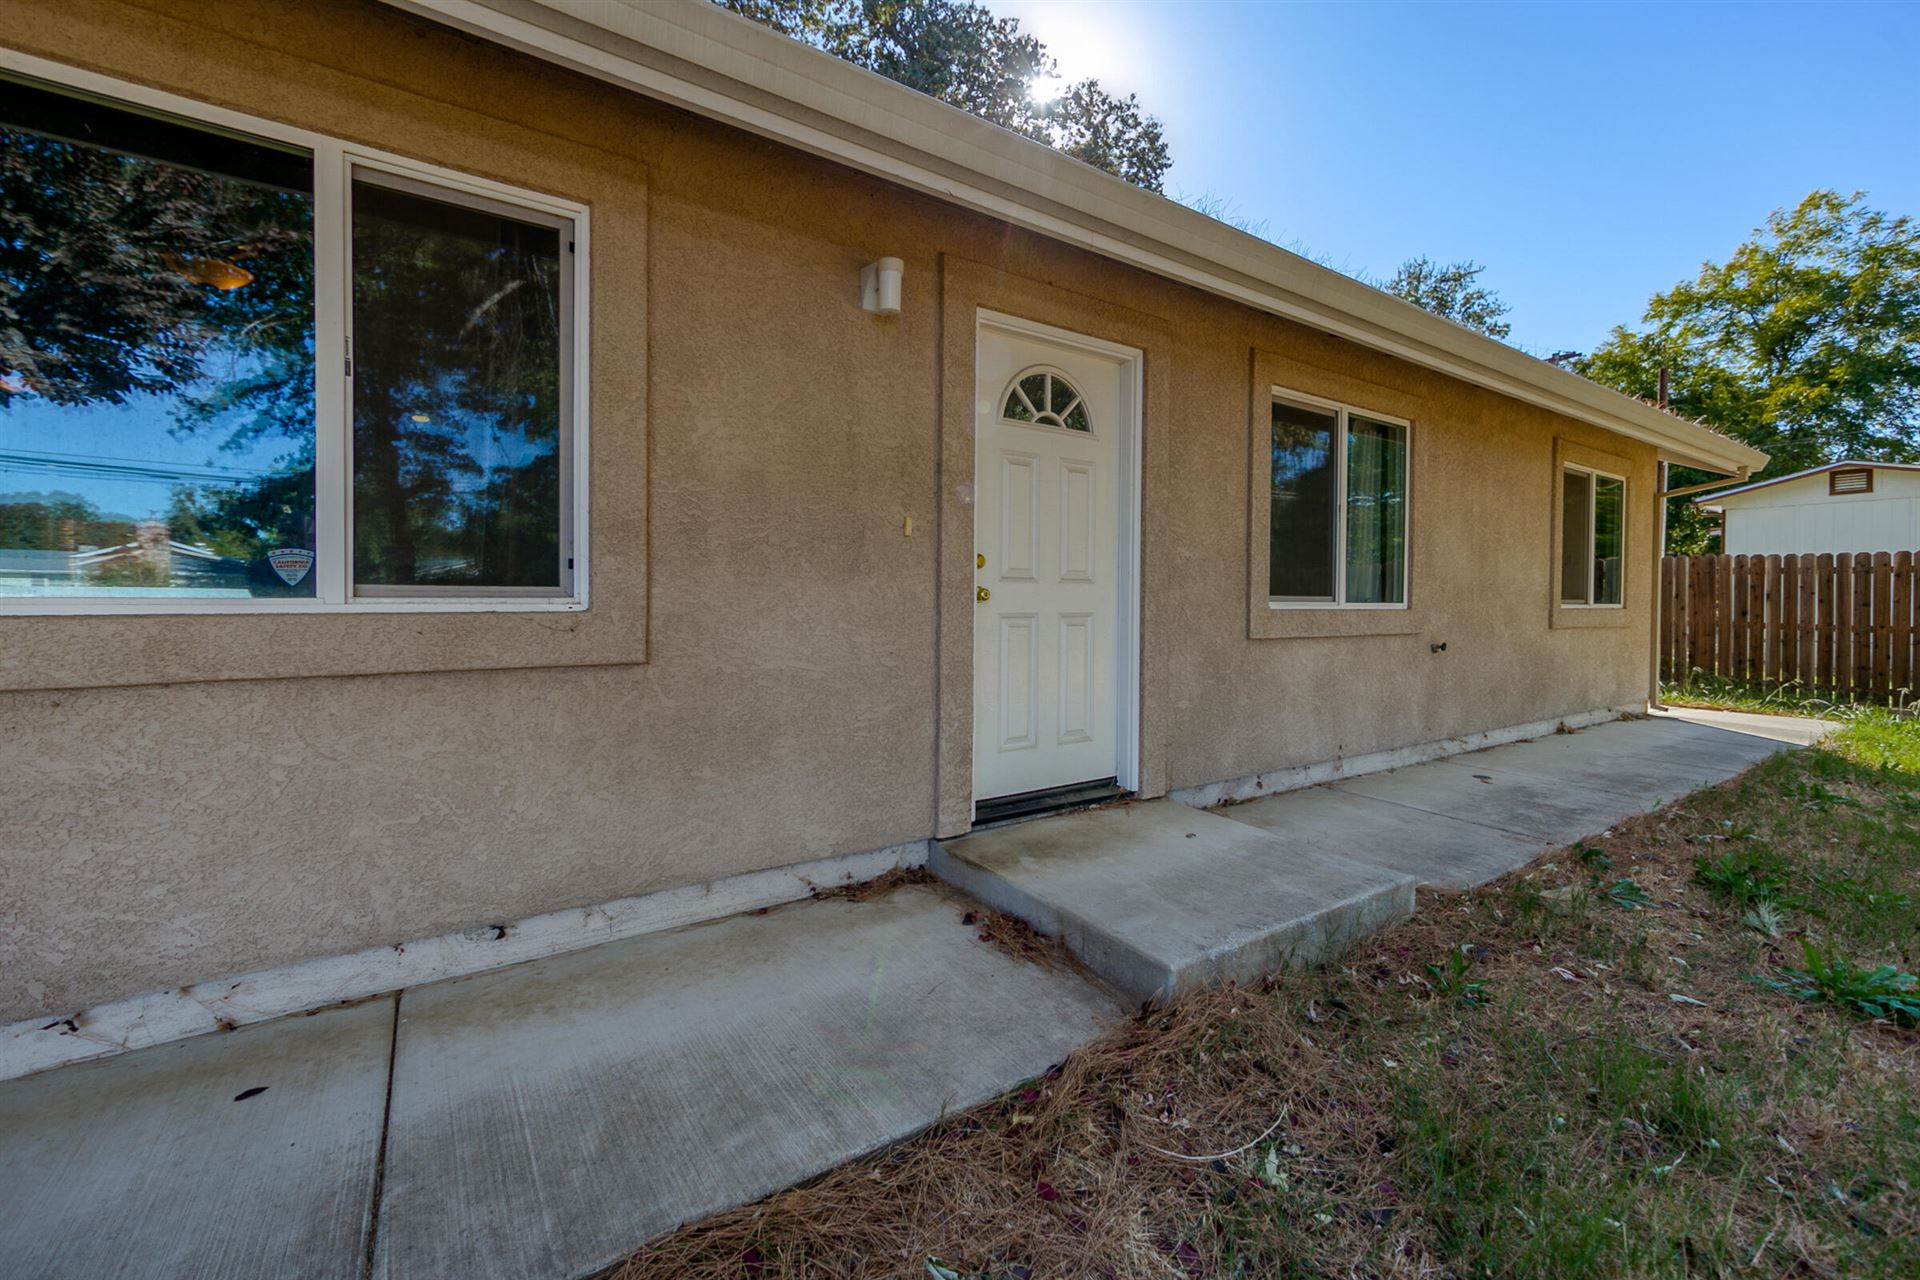 Photo of 19660 Broadhurst Rd, Cottonwood, CA 96022 (MLS # 21-4924)